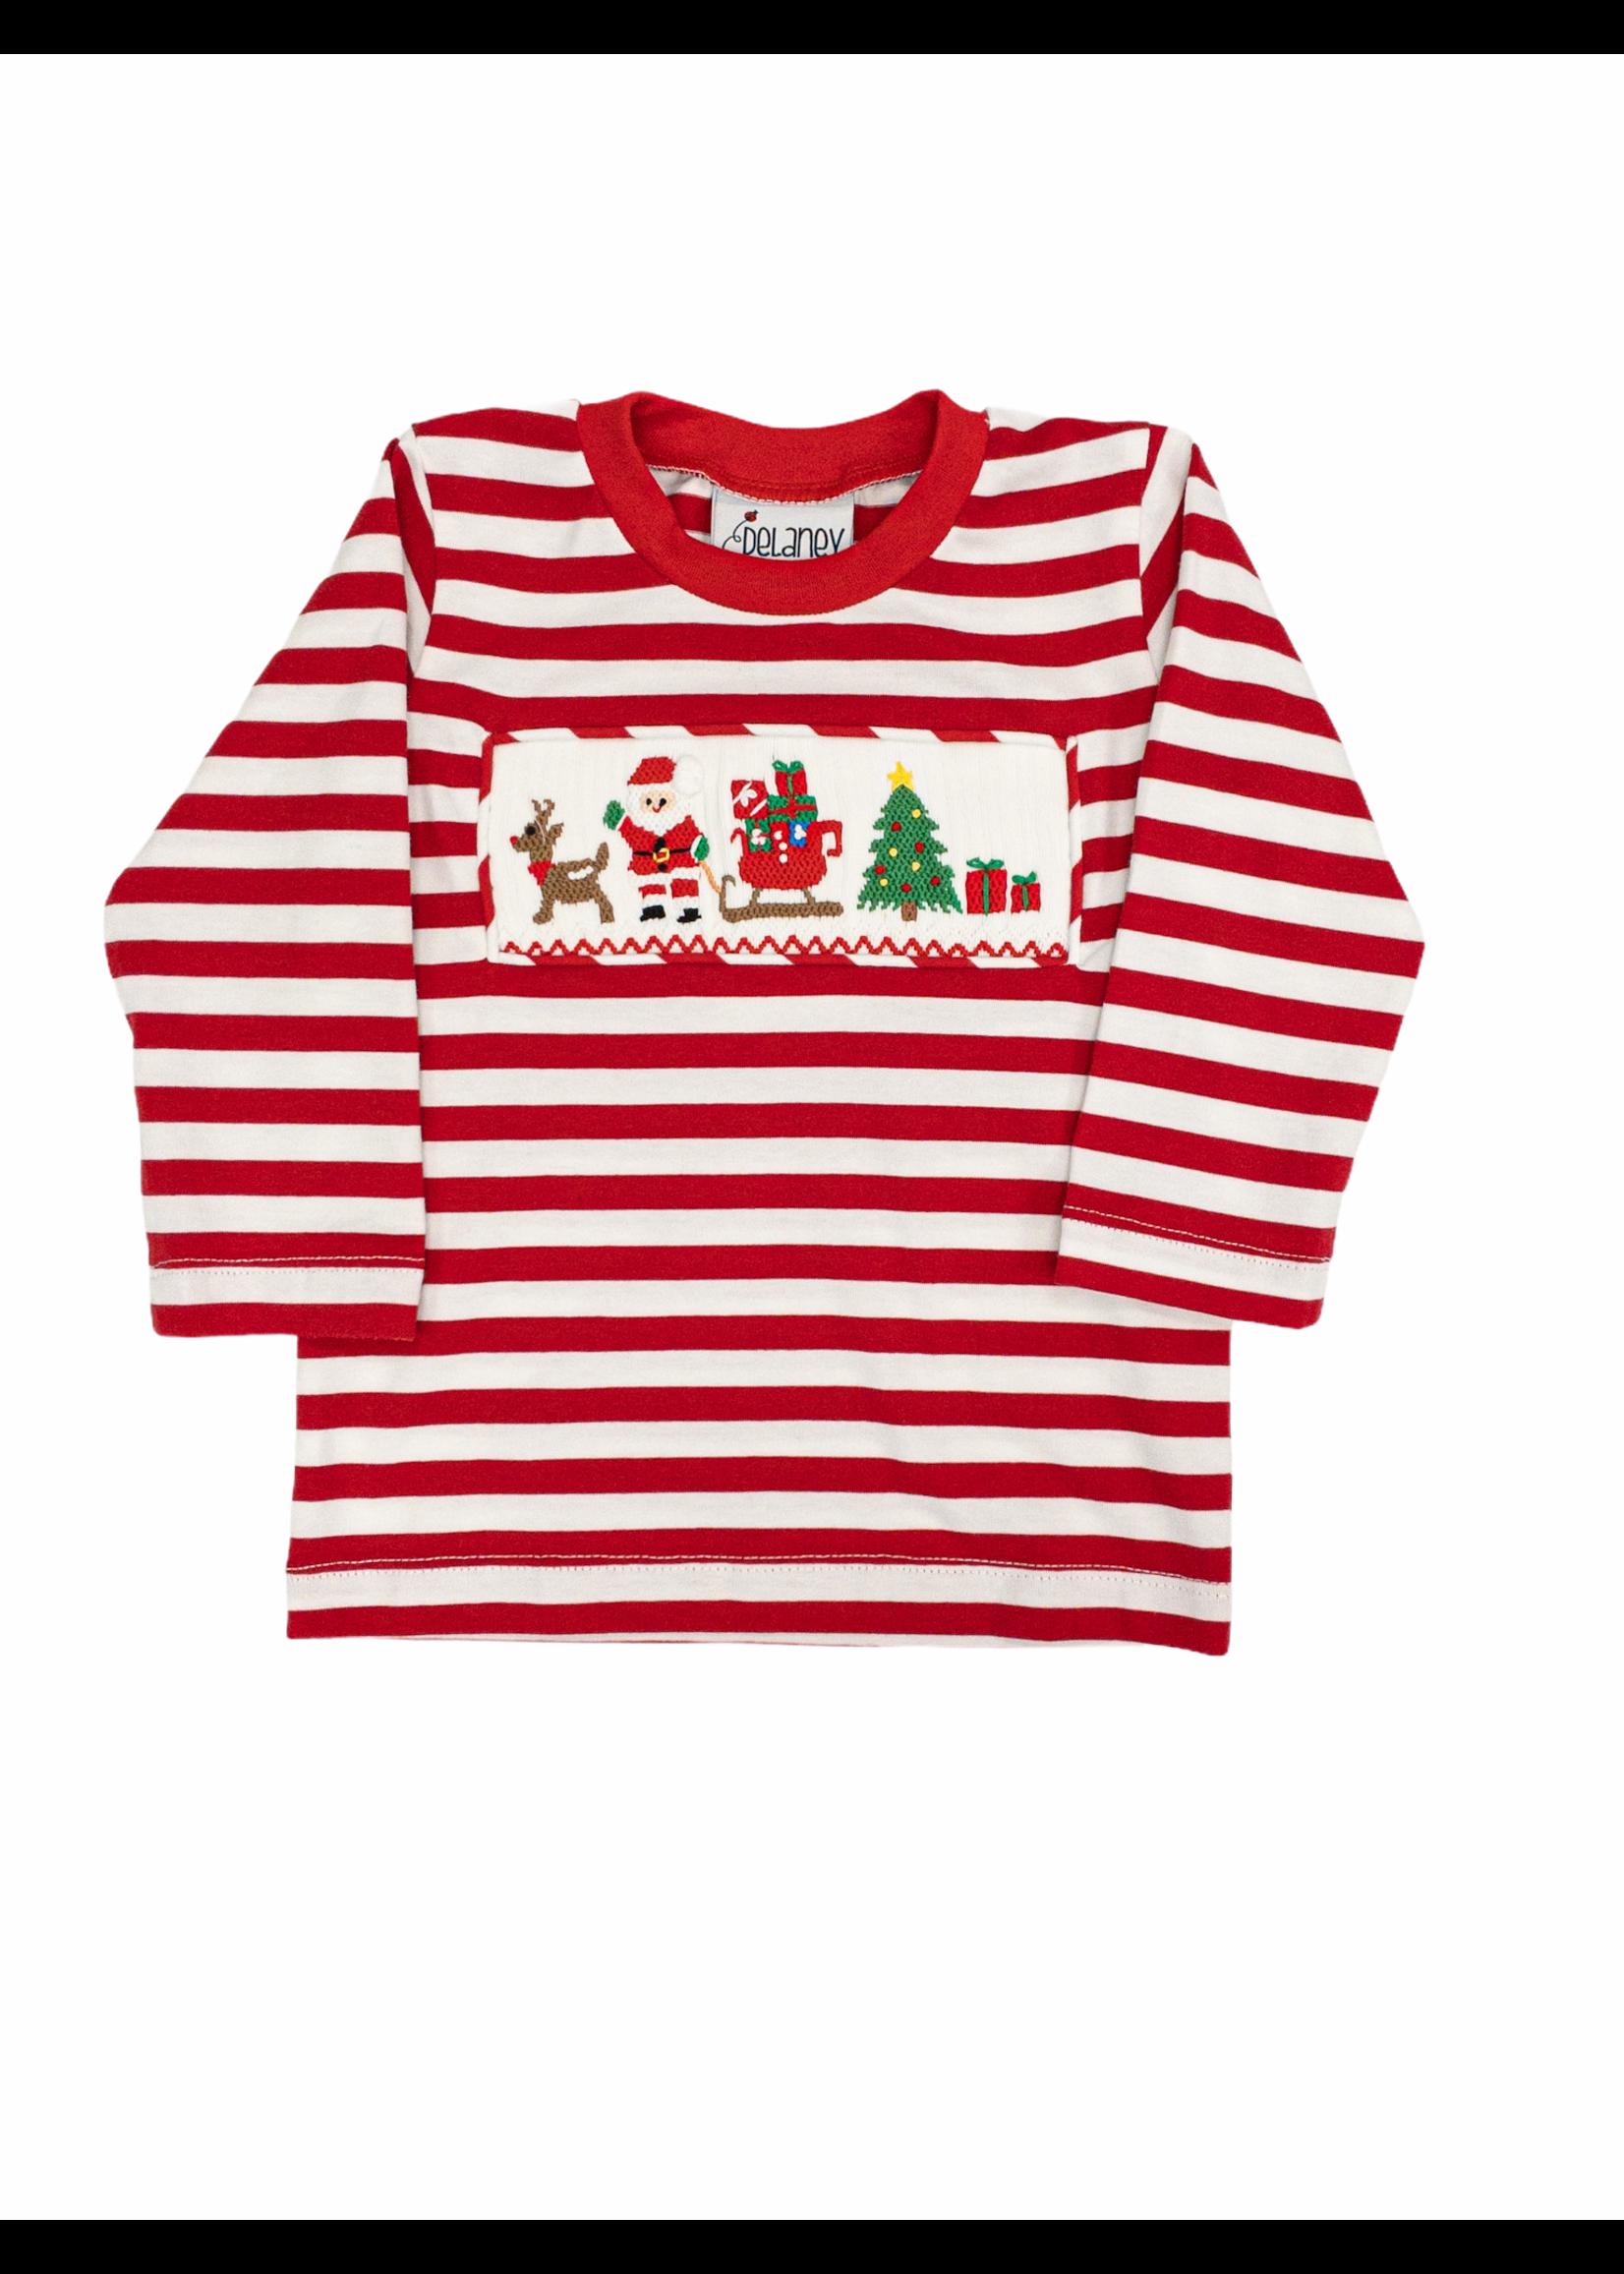 Delaney Red Stripe LS Smocked Santa Tree Reindeer